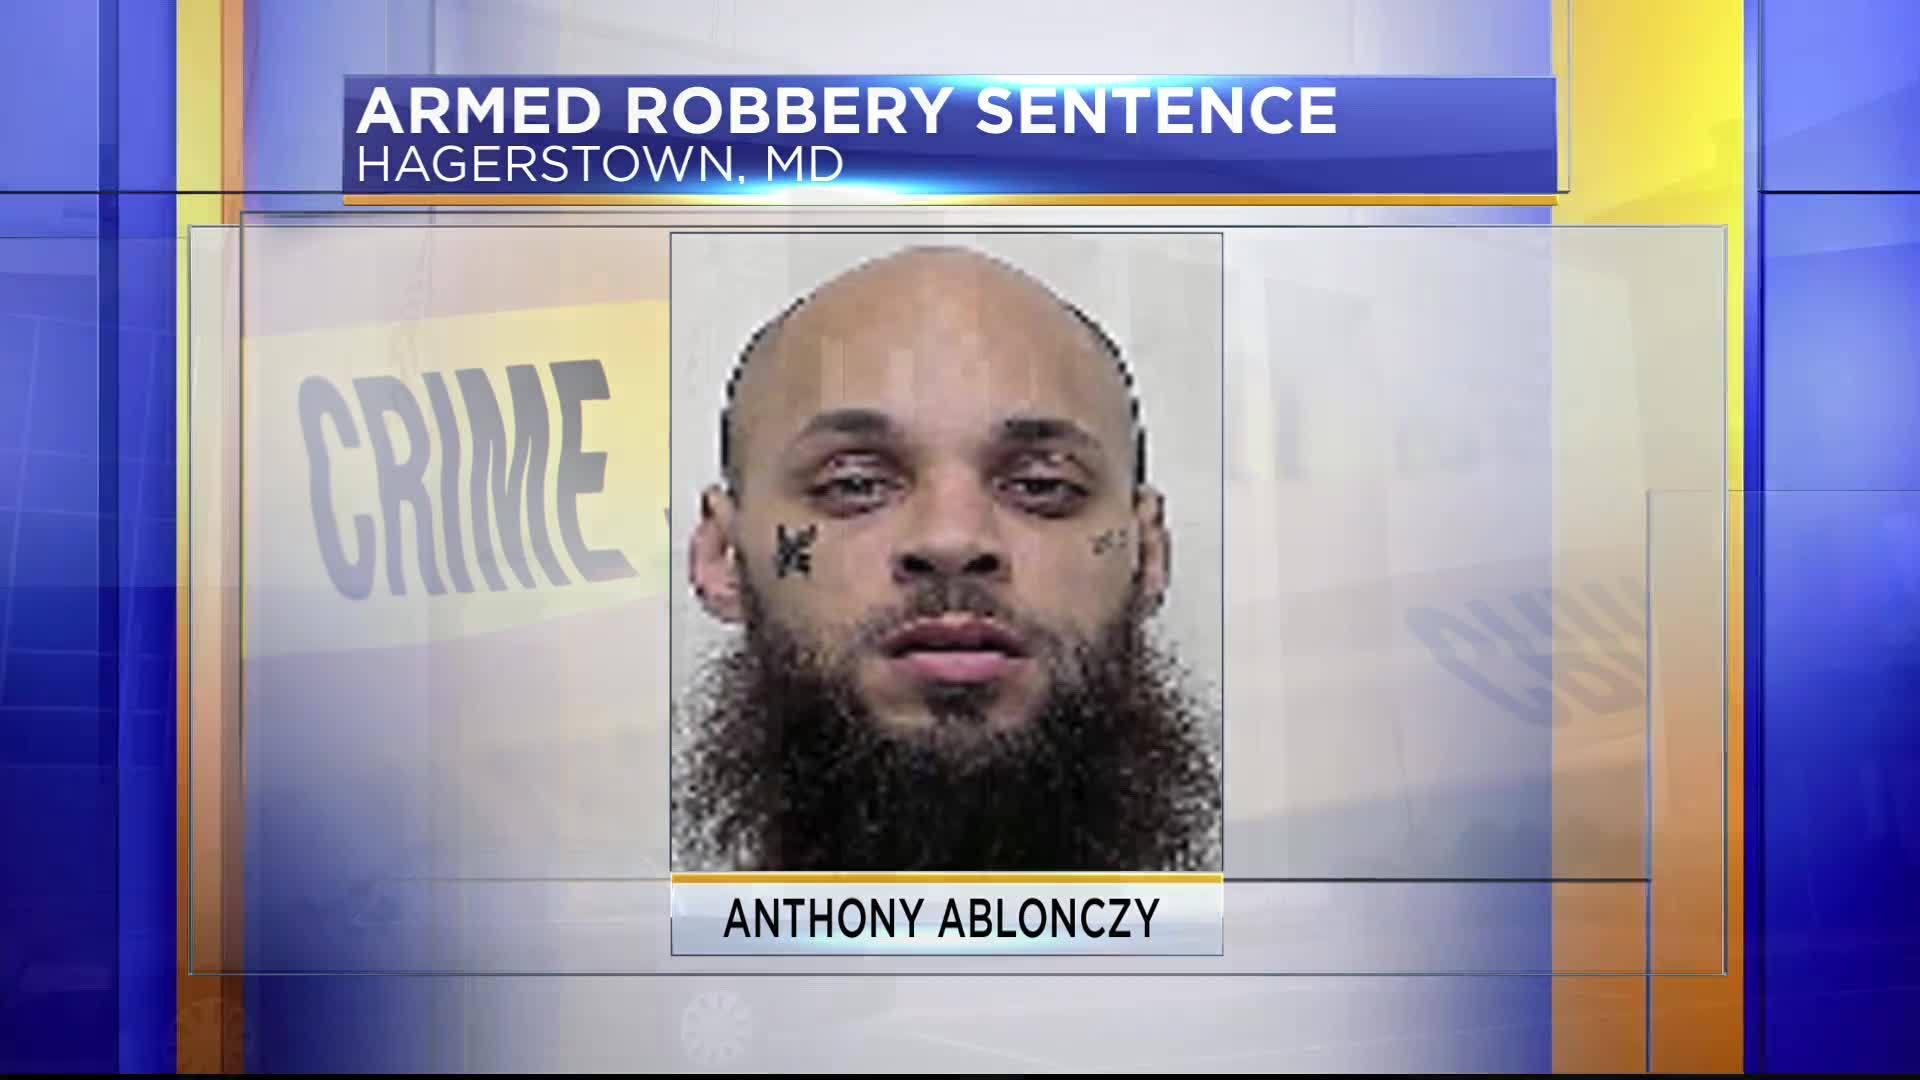 Robbery_Sentence_5_20181210221627